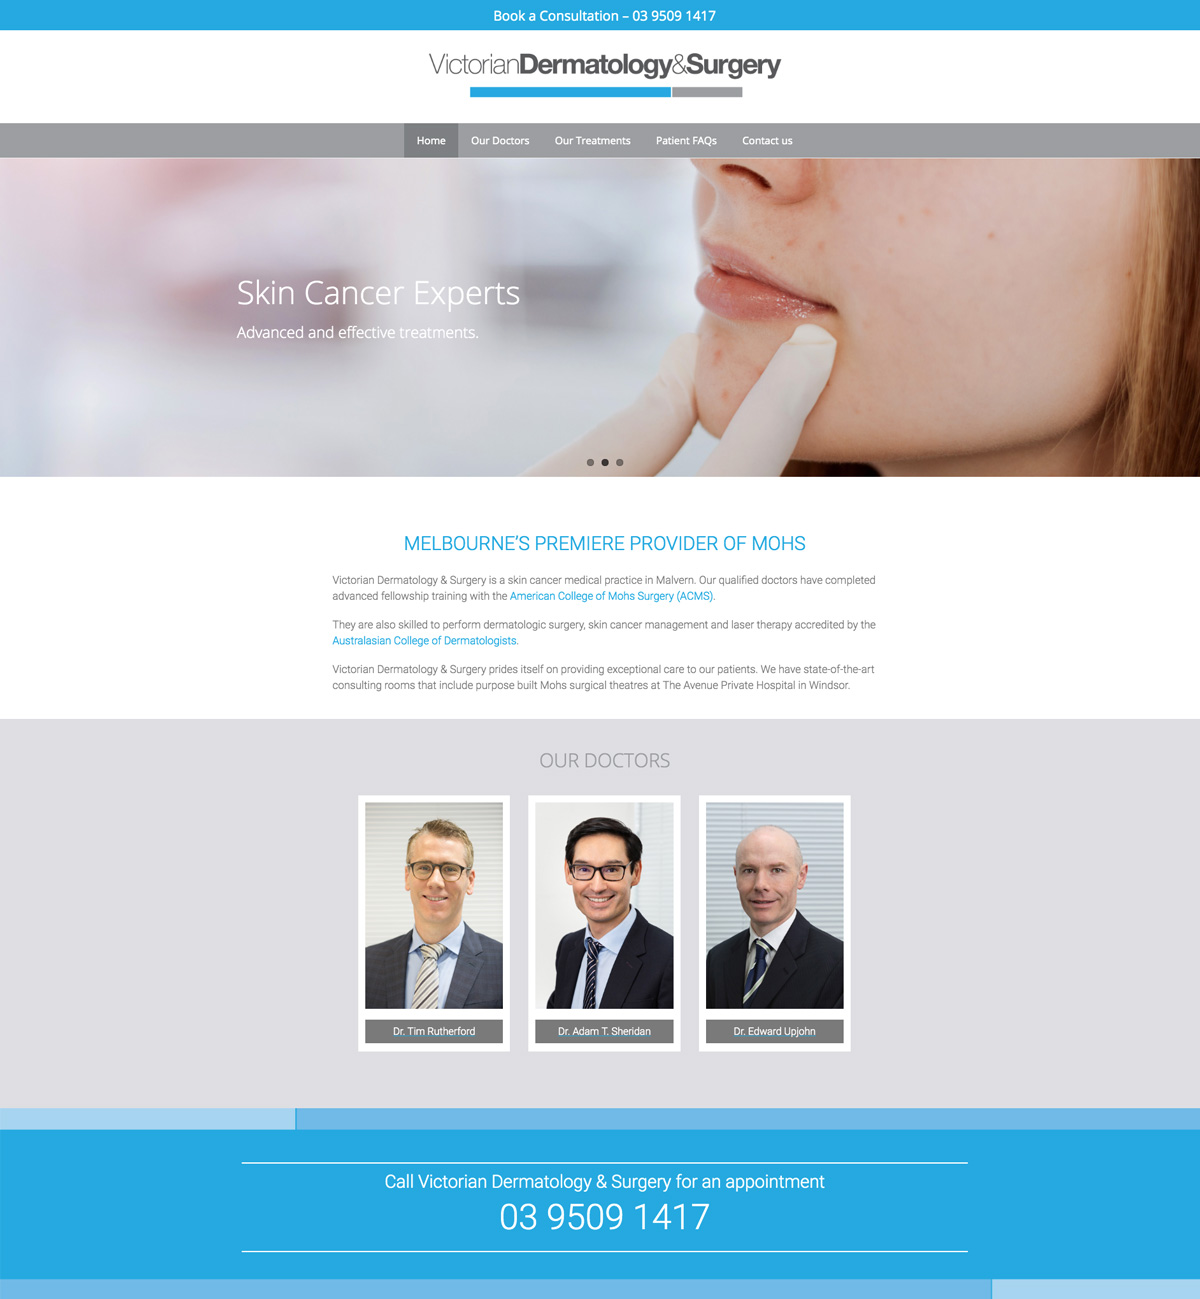 VDAS Website